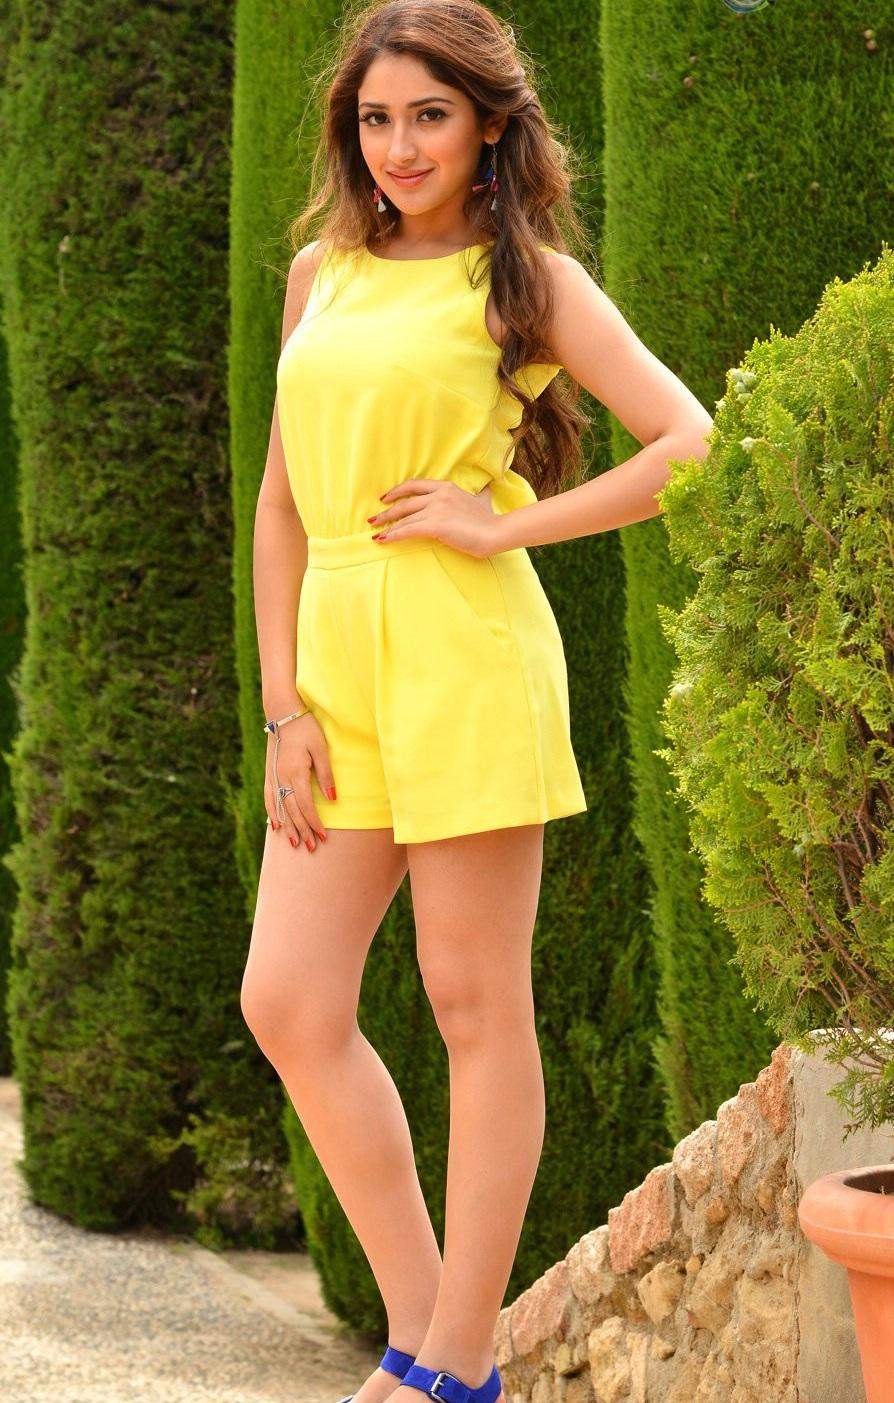 Sayesha Saigal sexy images